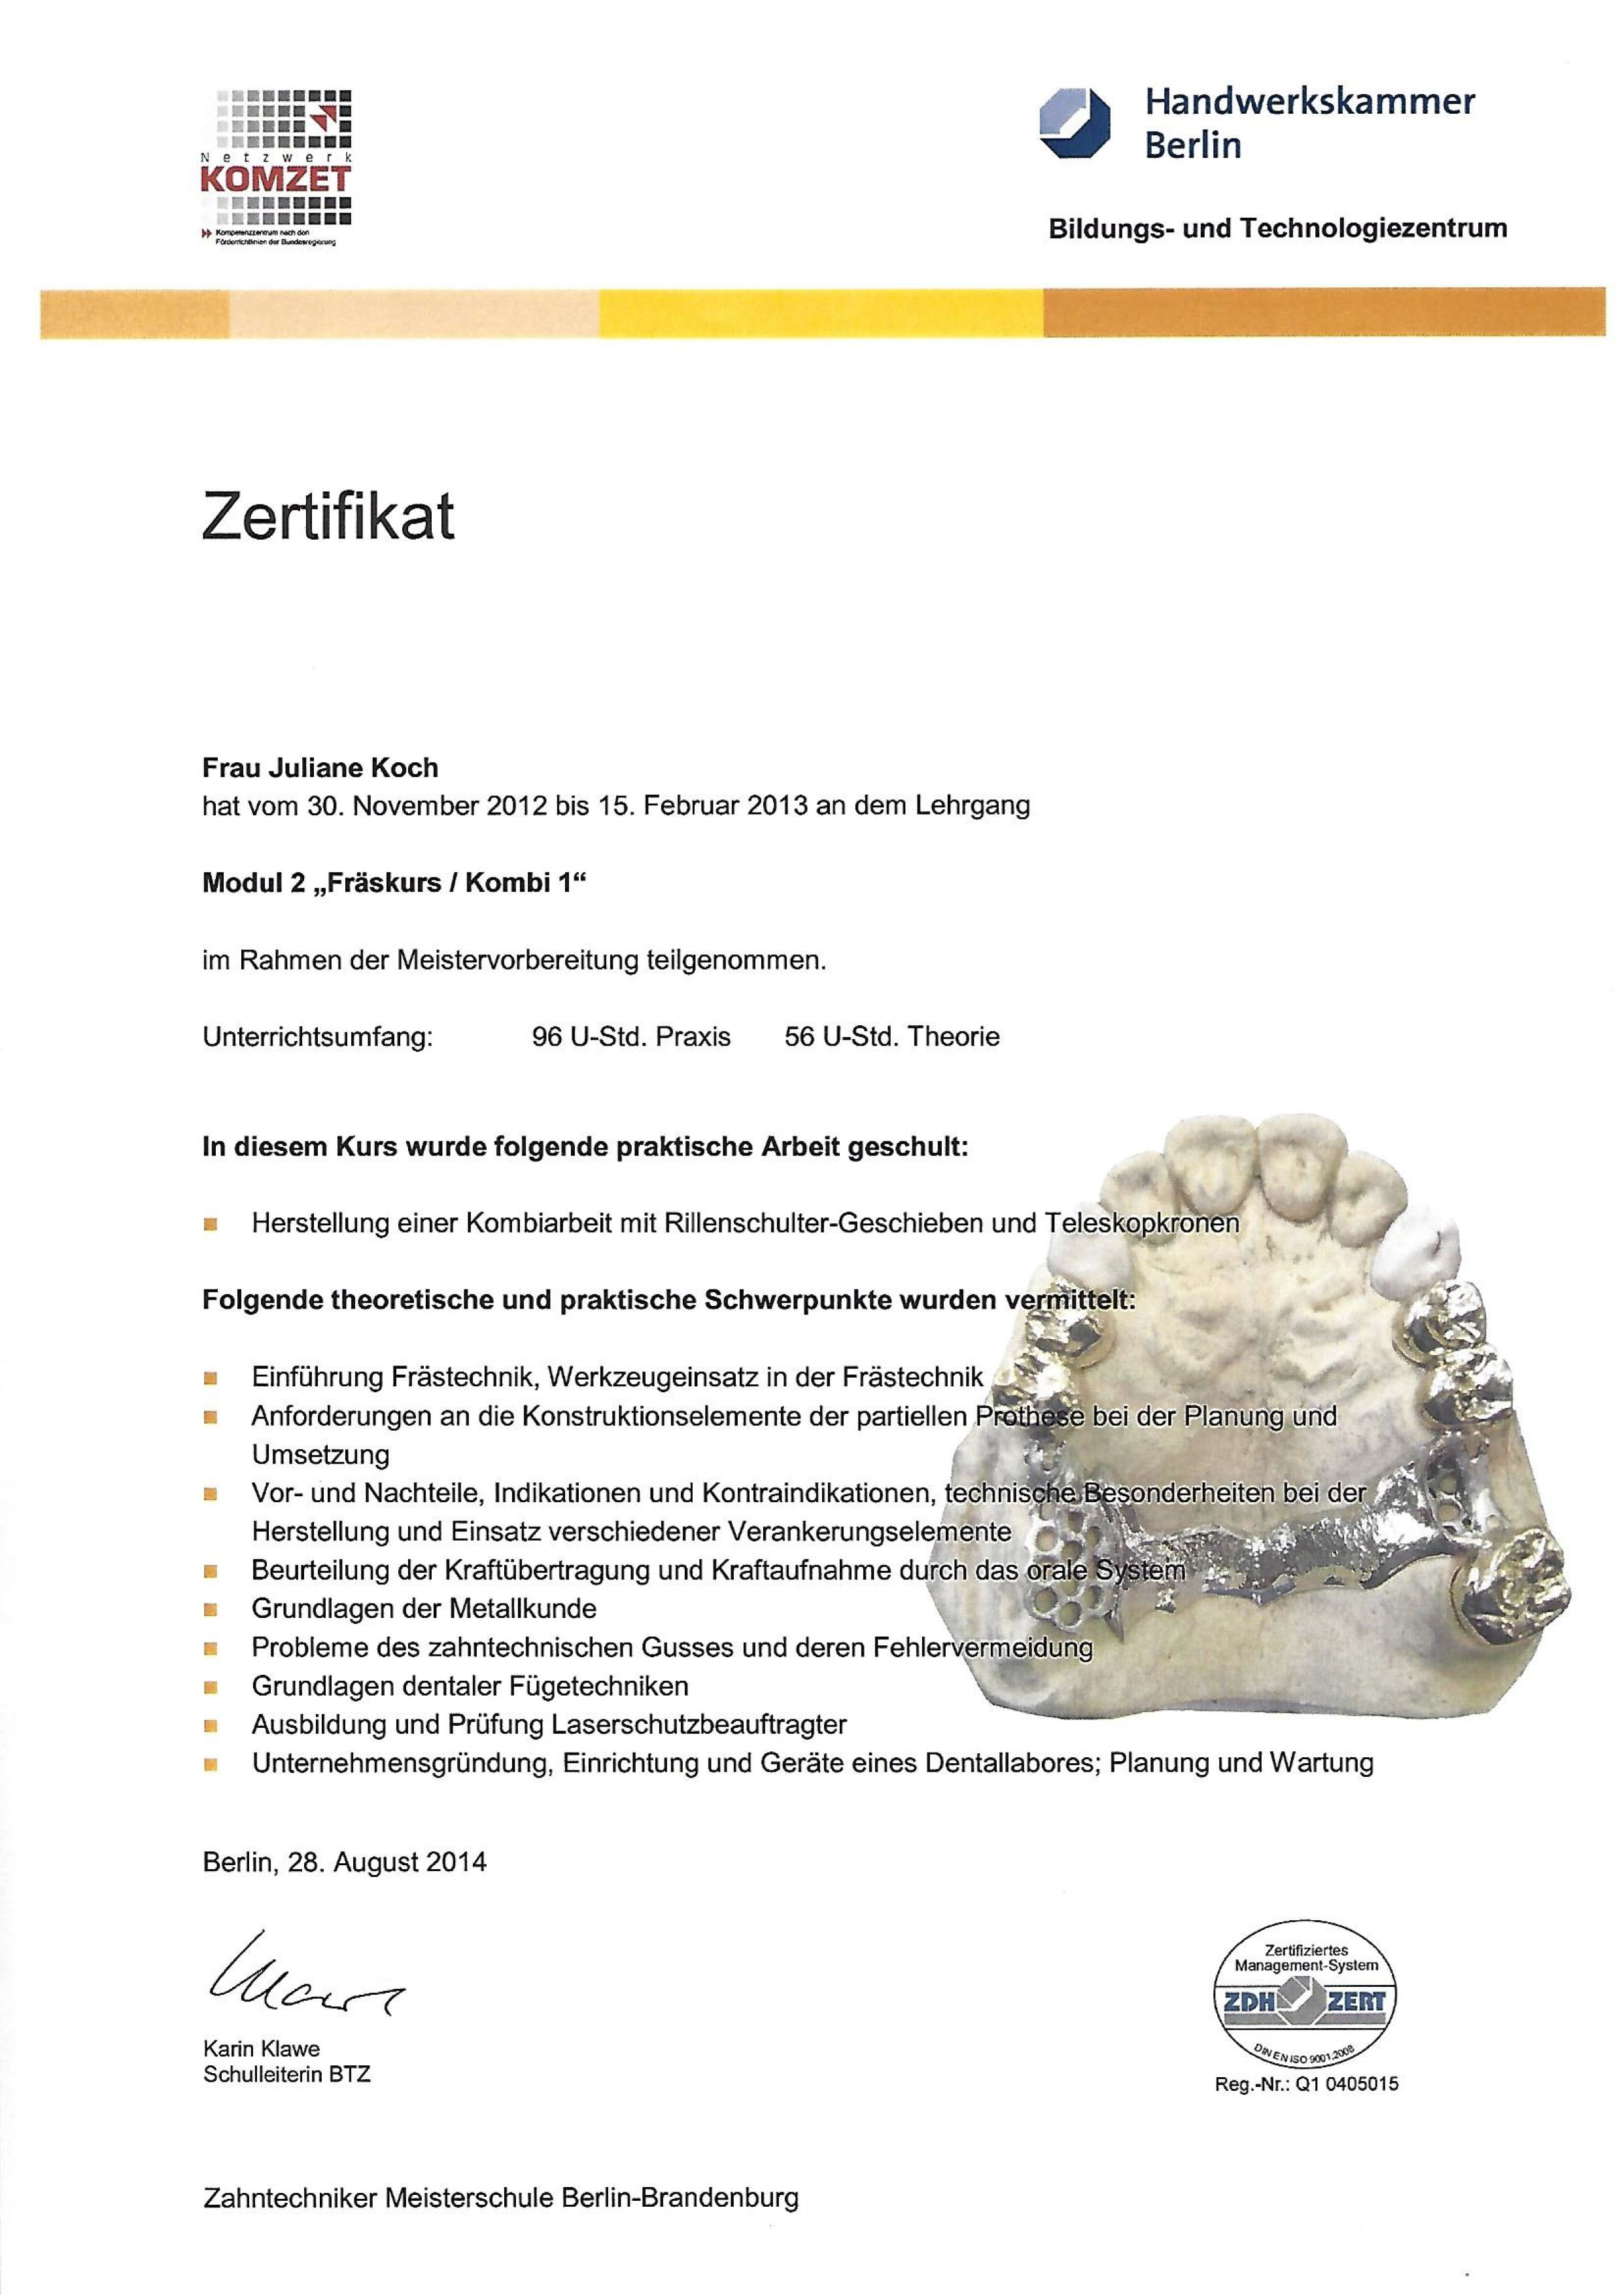 Groß Außenrahmen Packs Ideen - Rahmen Ideen - markjohnsonshow.info